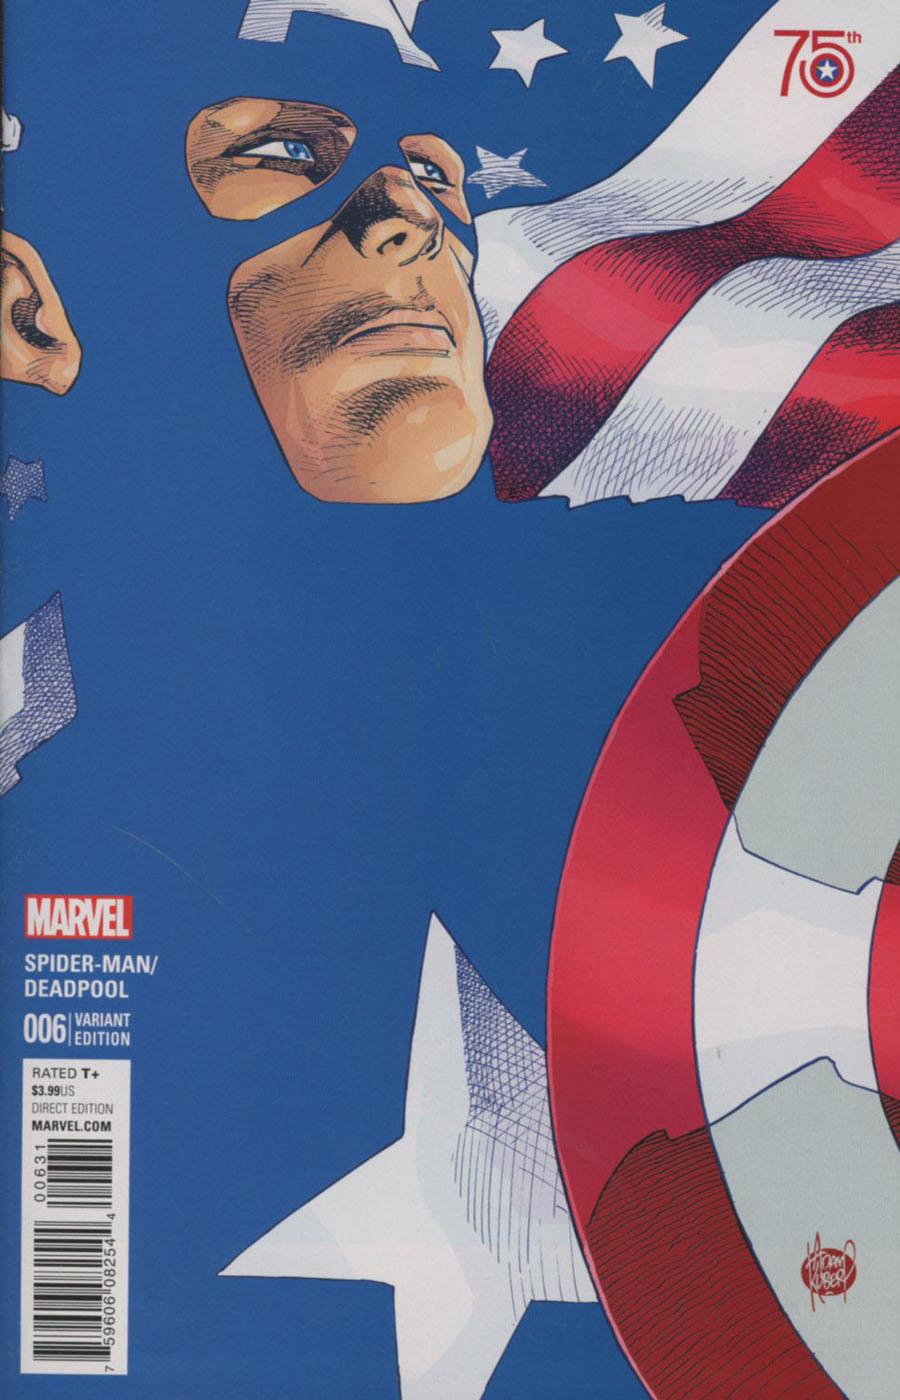 Spider-Man Deadpool #6 Cover B Incentive Adam Kubert Captain America 75th Anniversary Variant Cover